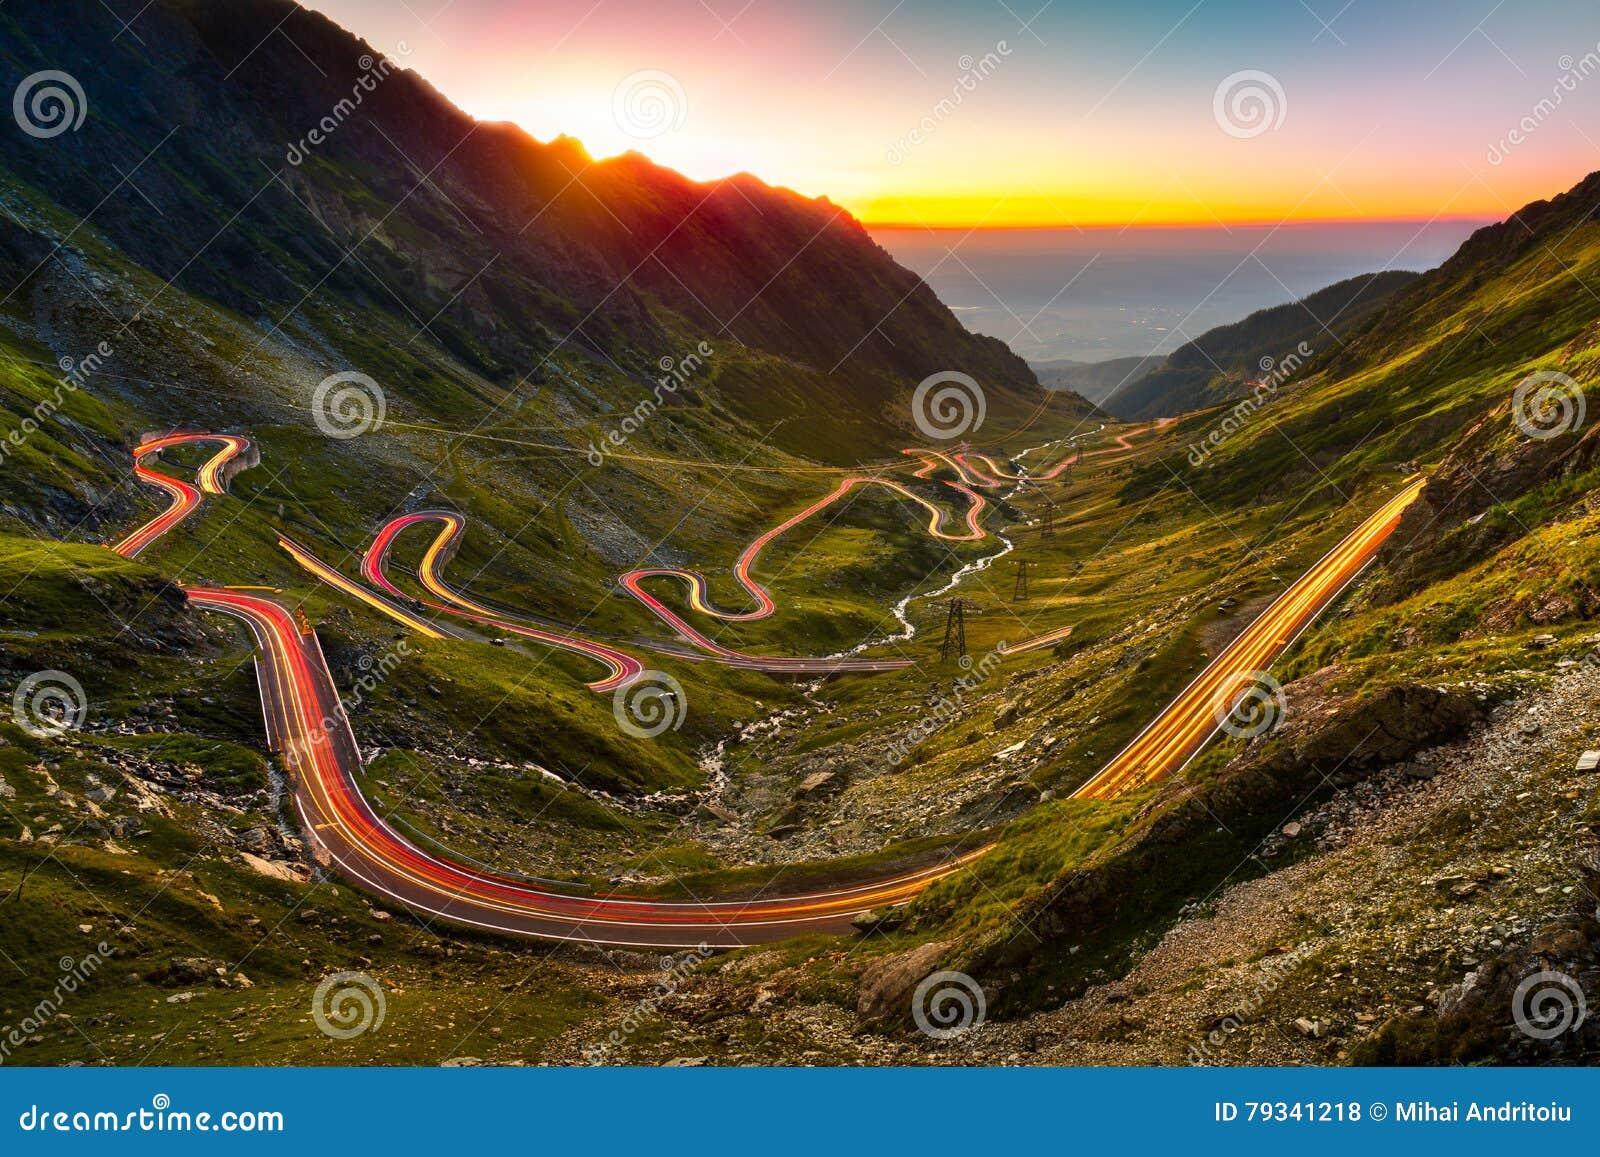 Traffic trails on Transfagarasan pass